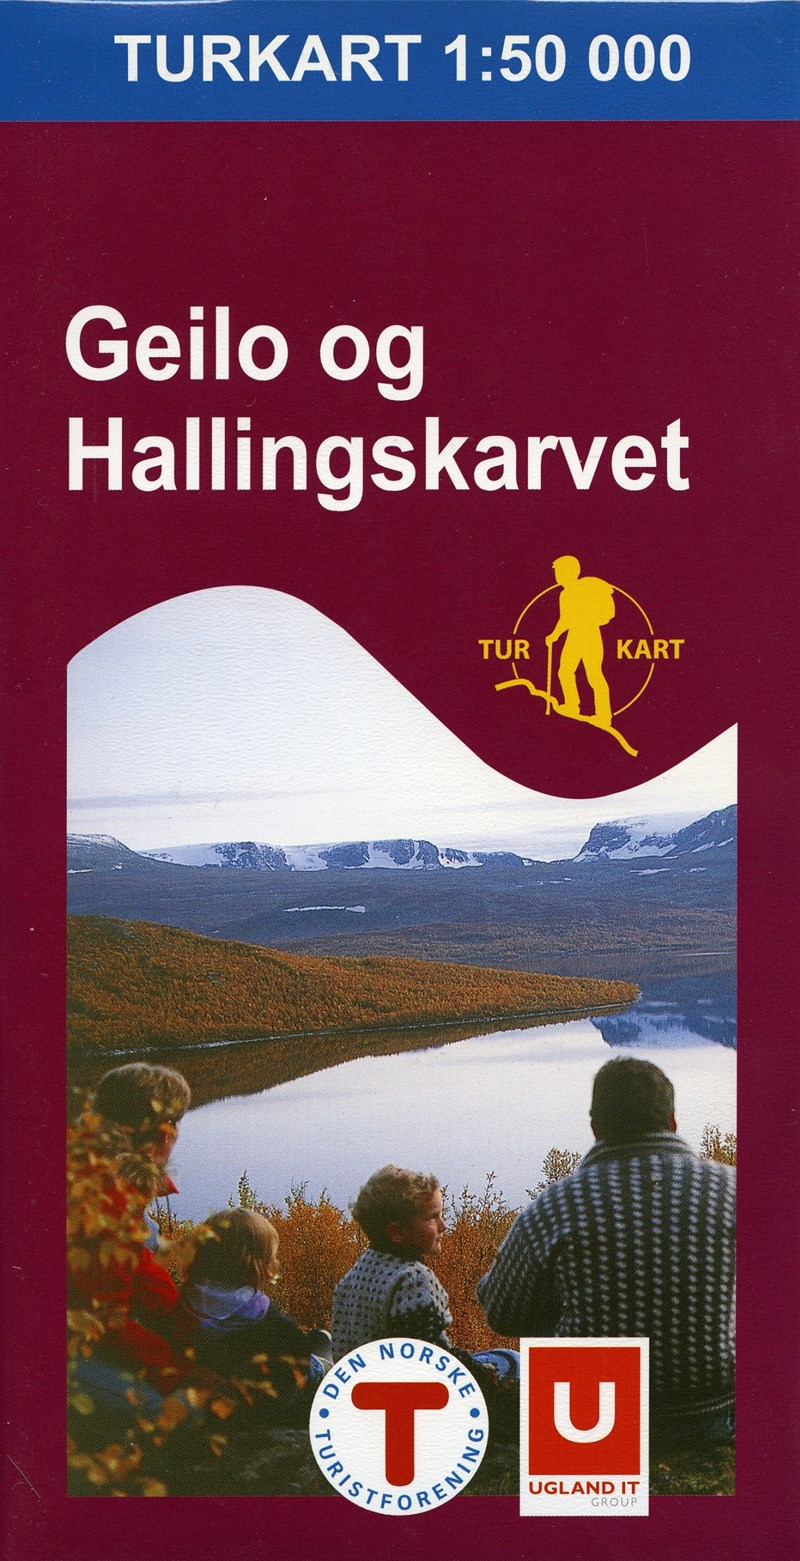 Wandelkaart 2519 Turkart Geilo og Hallingskarvet | Nordeca